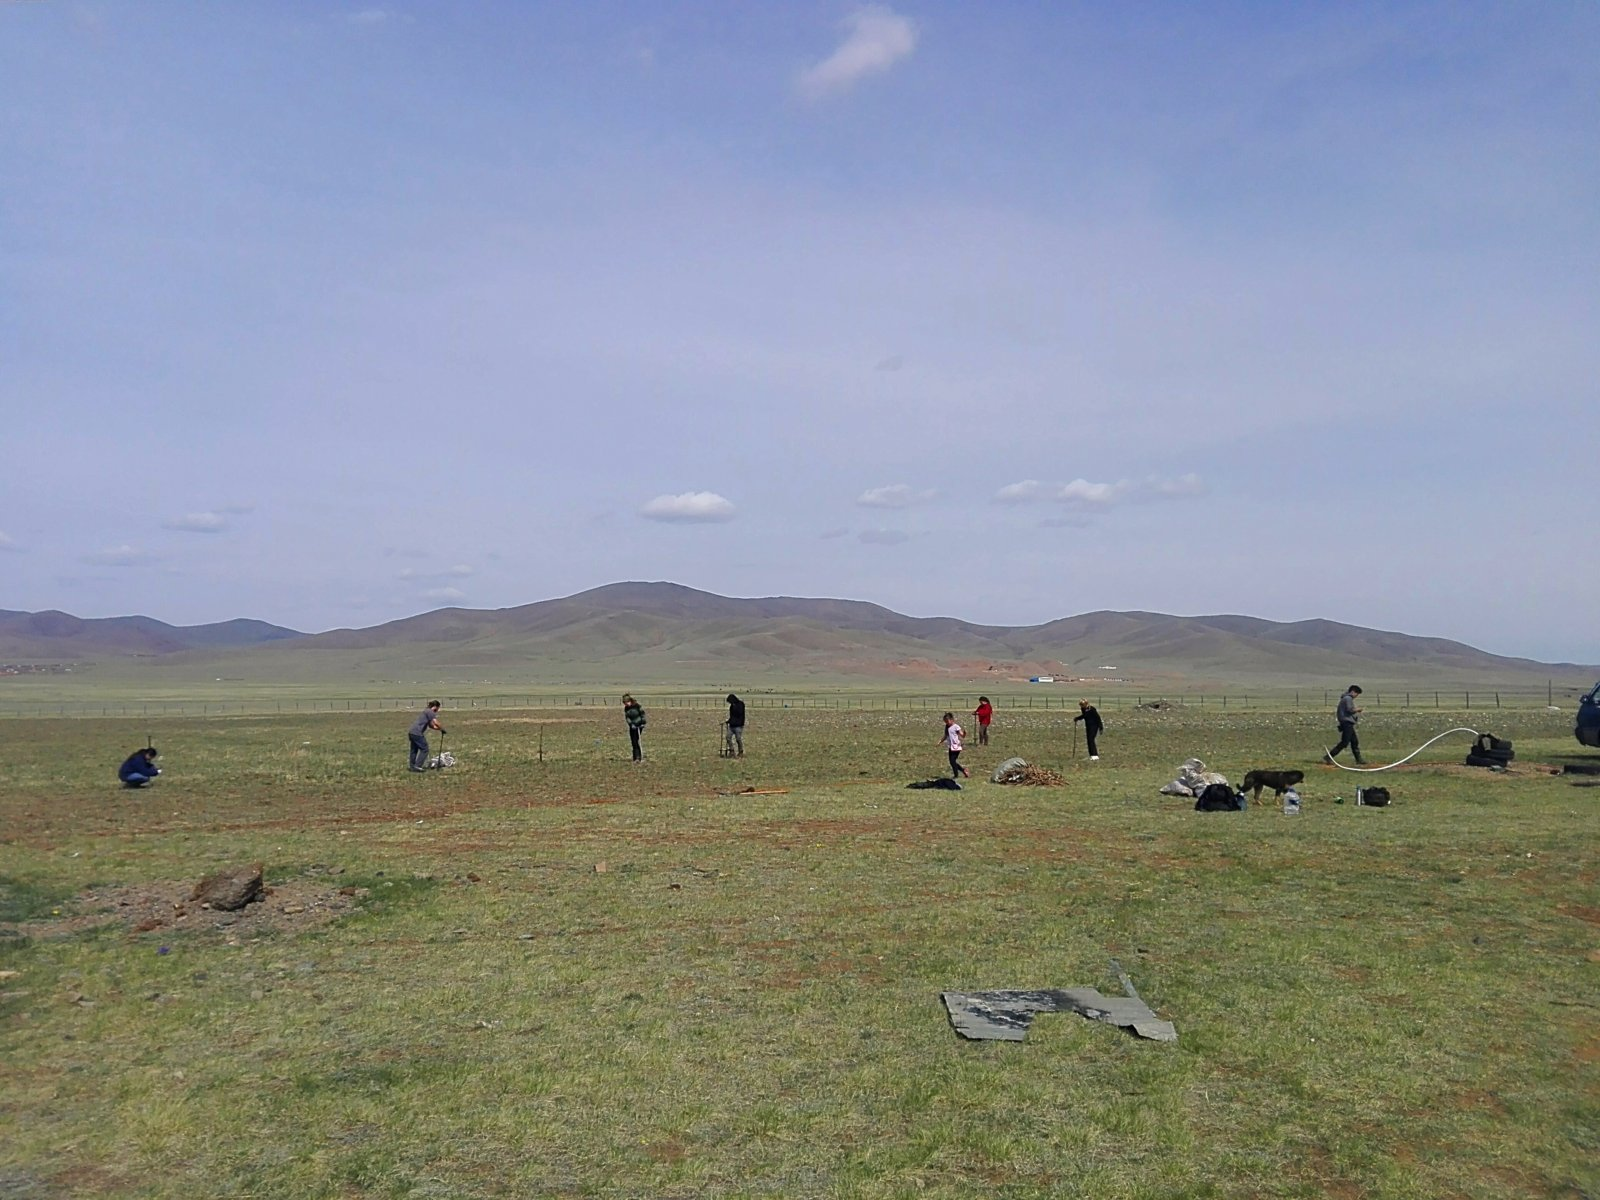 img_20160524_012727-jpg.30631_Mongolia Rainbow Horse Caravan_Travel Stories_Squat the Planet_4:14 AM